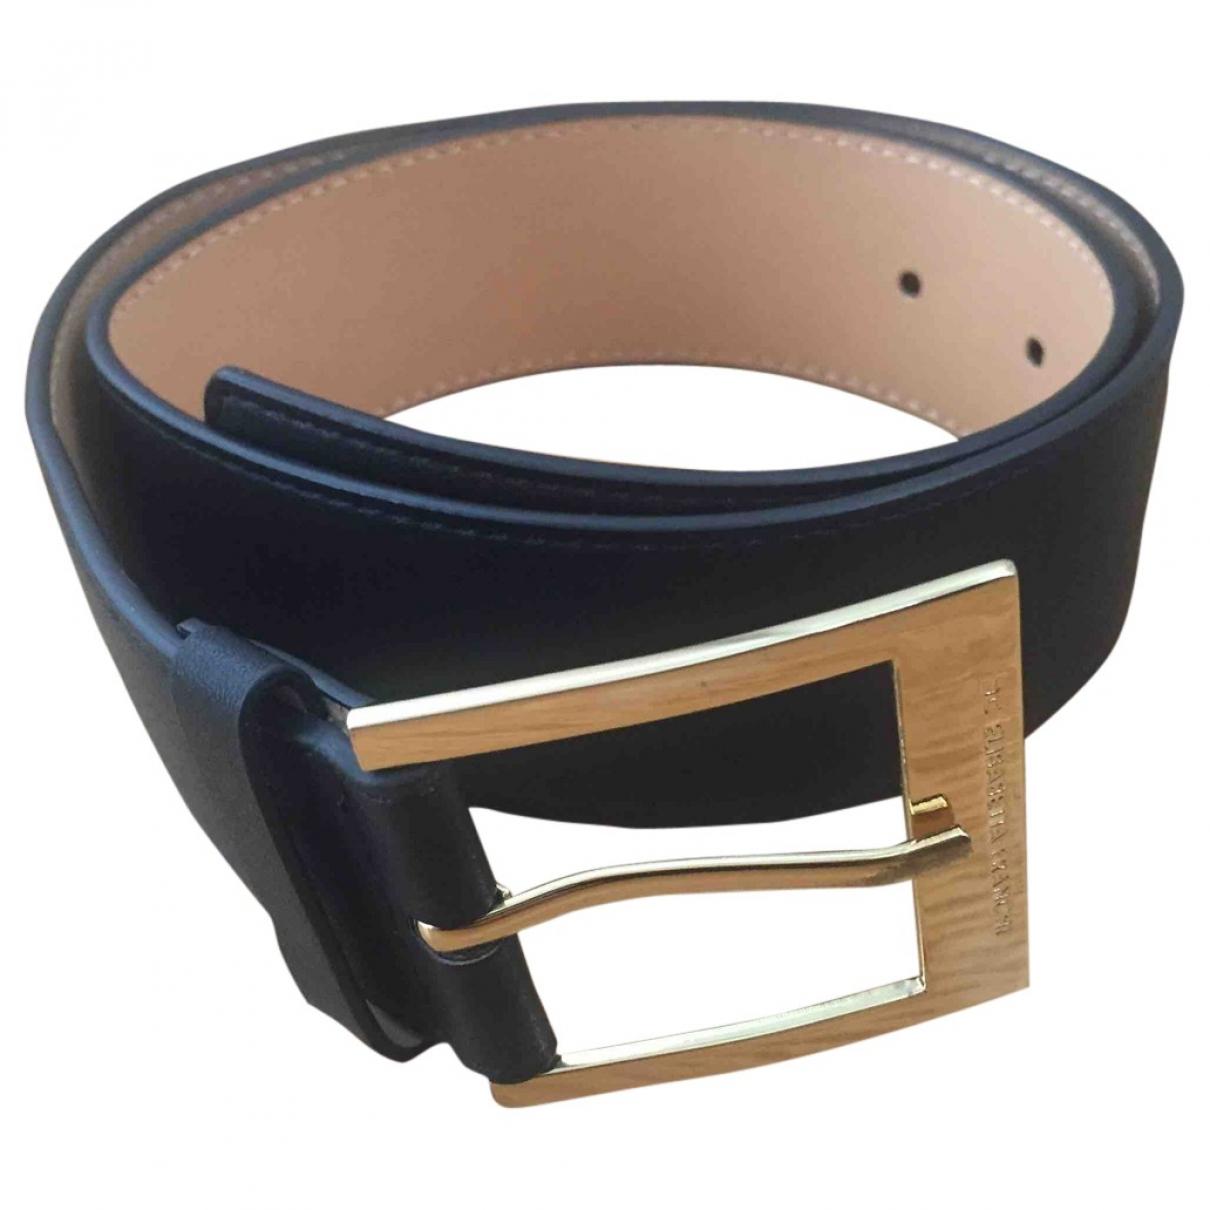 Elisabetta Franchi \N Black Leather belt for Women XS International